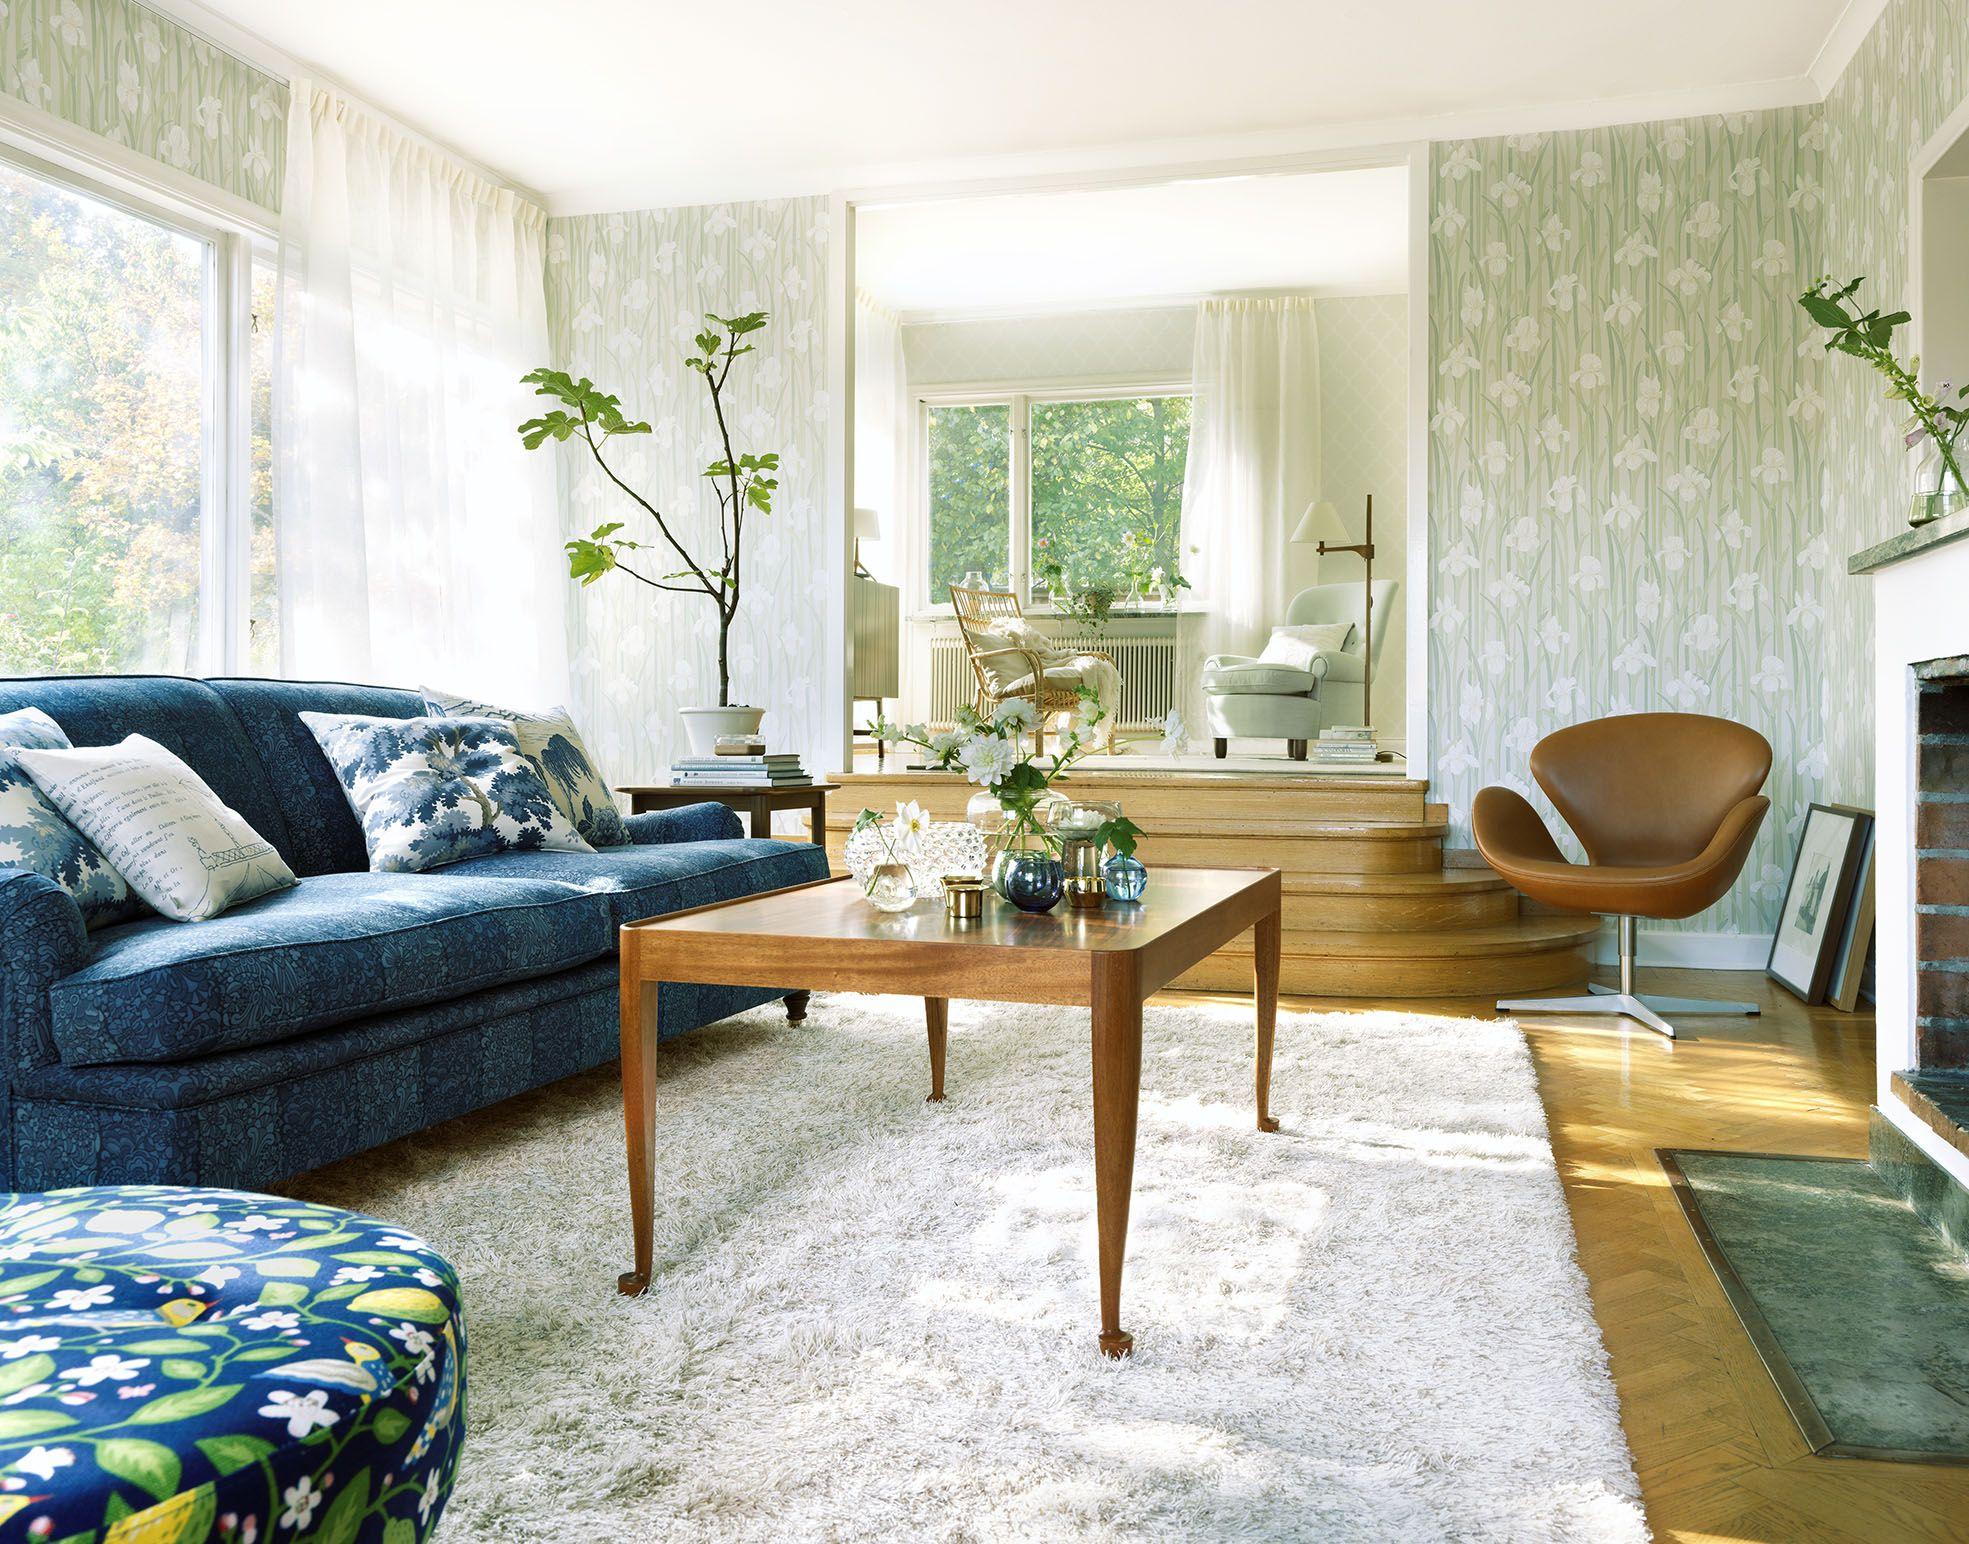 Sandberg Wallpaper and Fabric Livingroom with wallpaper Iris Fabric: Ian, Amalfi, Raphaela and Kina Slott